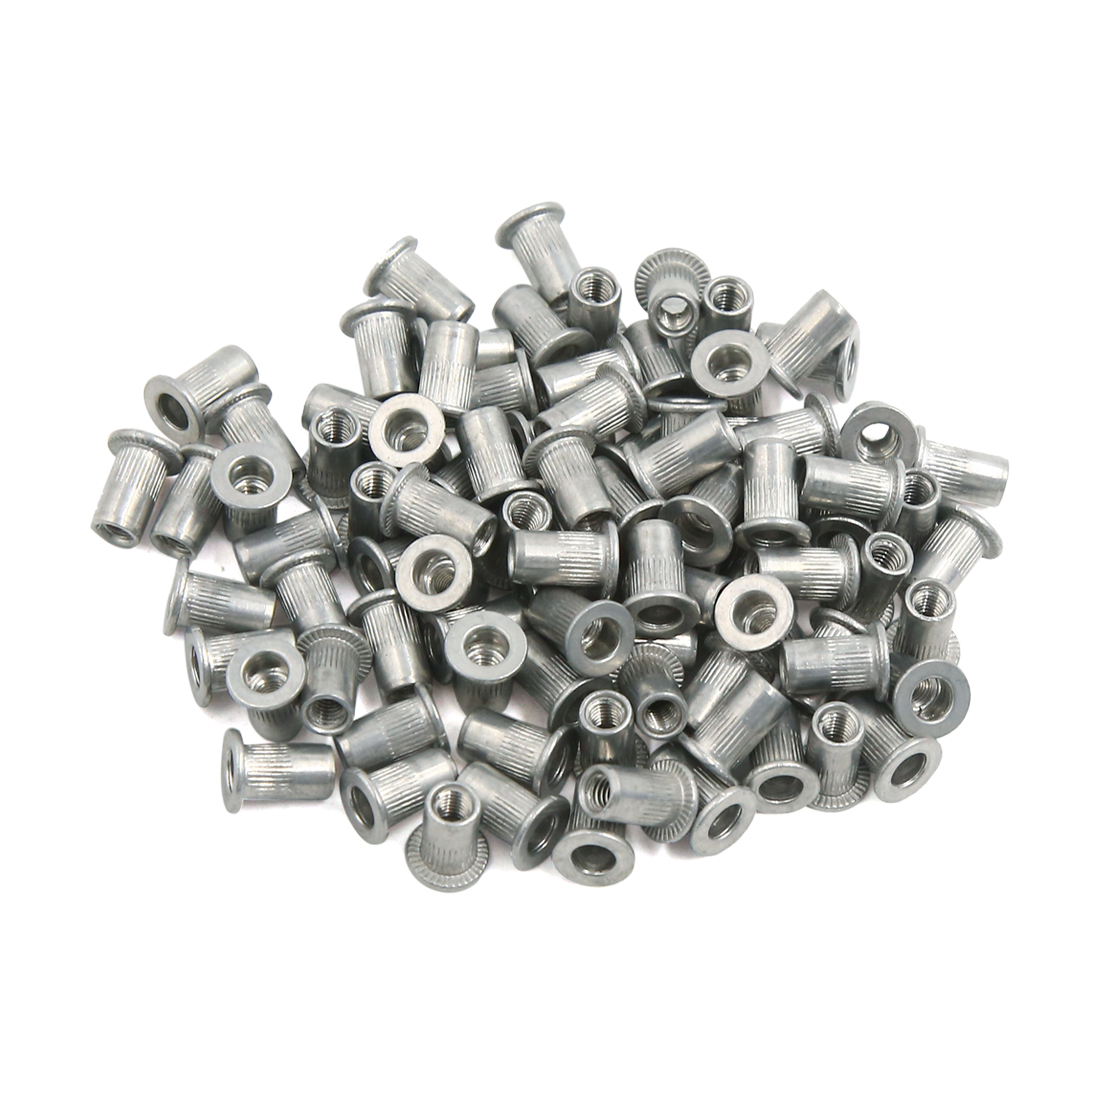 90 Pcs M4 Car Aluminum Alloy Thread Flat Head Rivet Nut Insert Nutserts